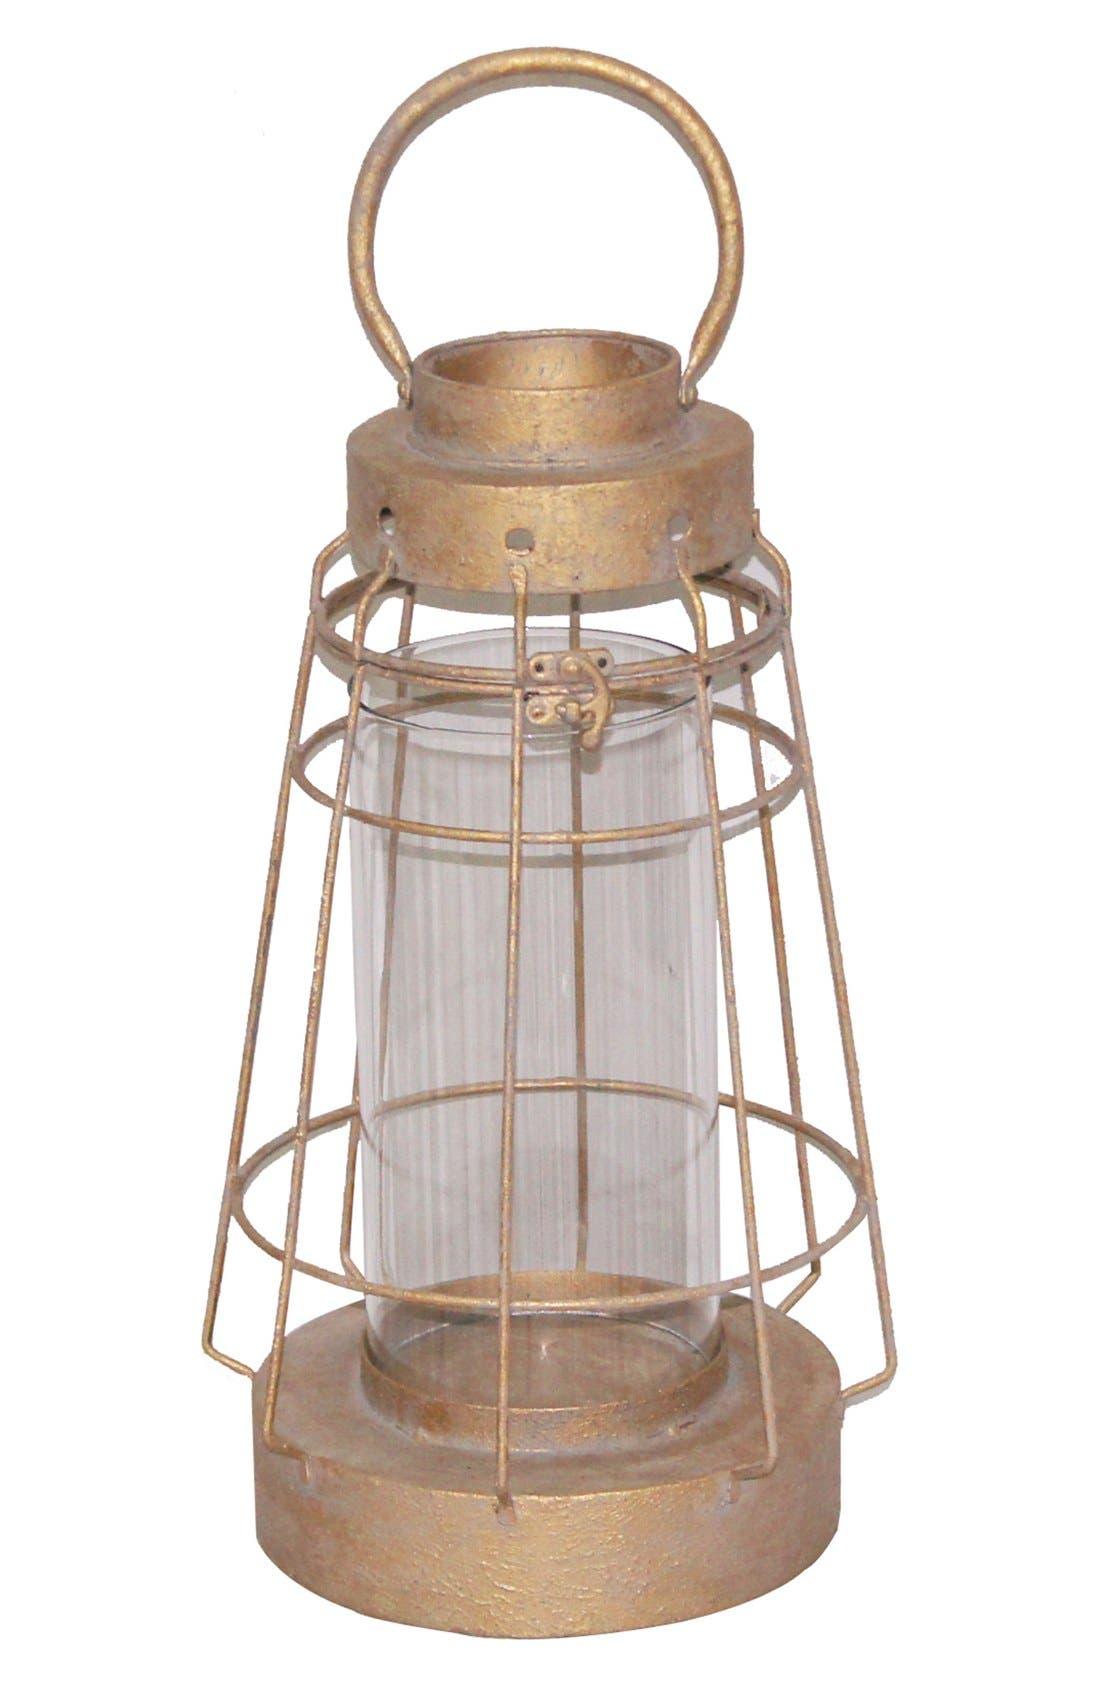 Alternate Image 1 Selected - Creative Co-Op Wood & Metal Lantern Candle Holder